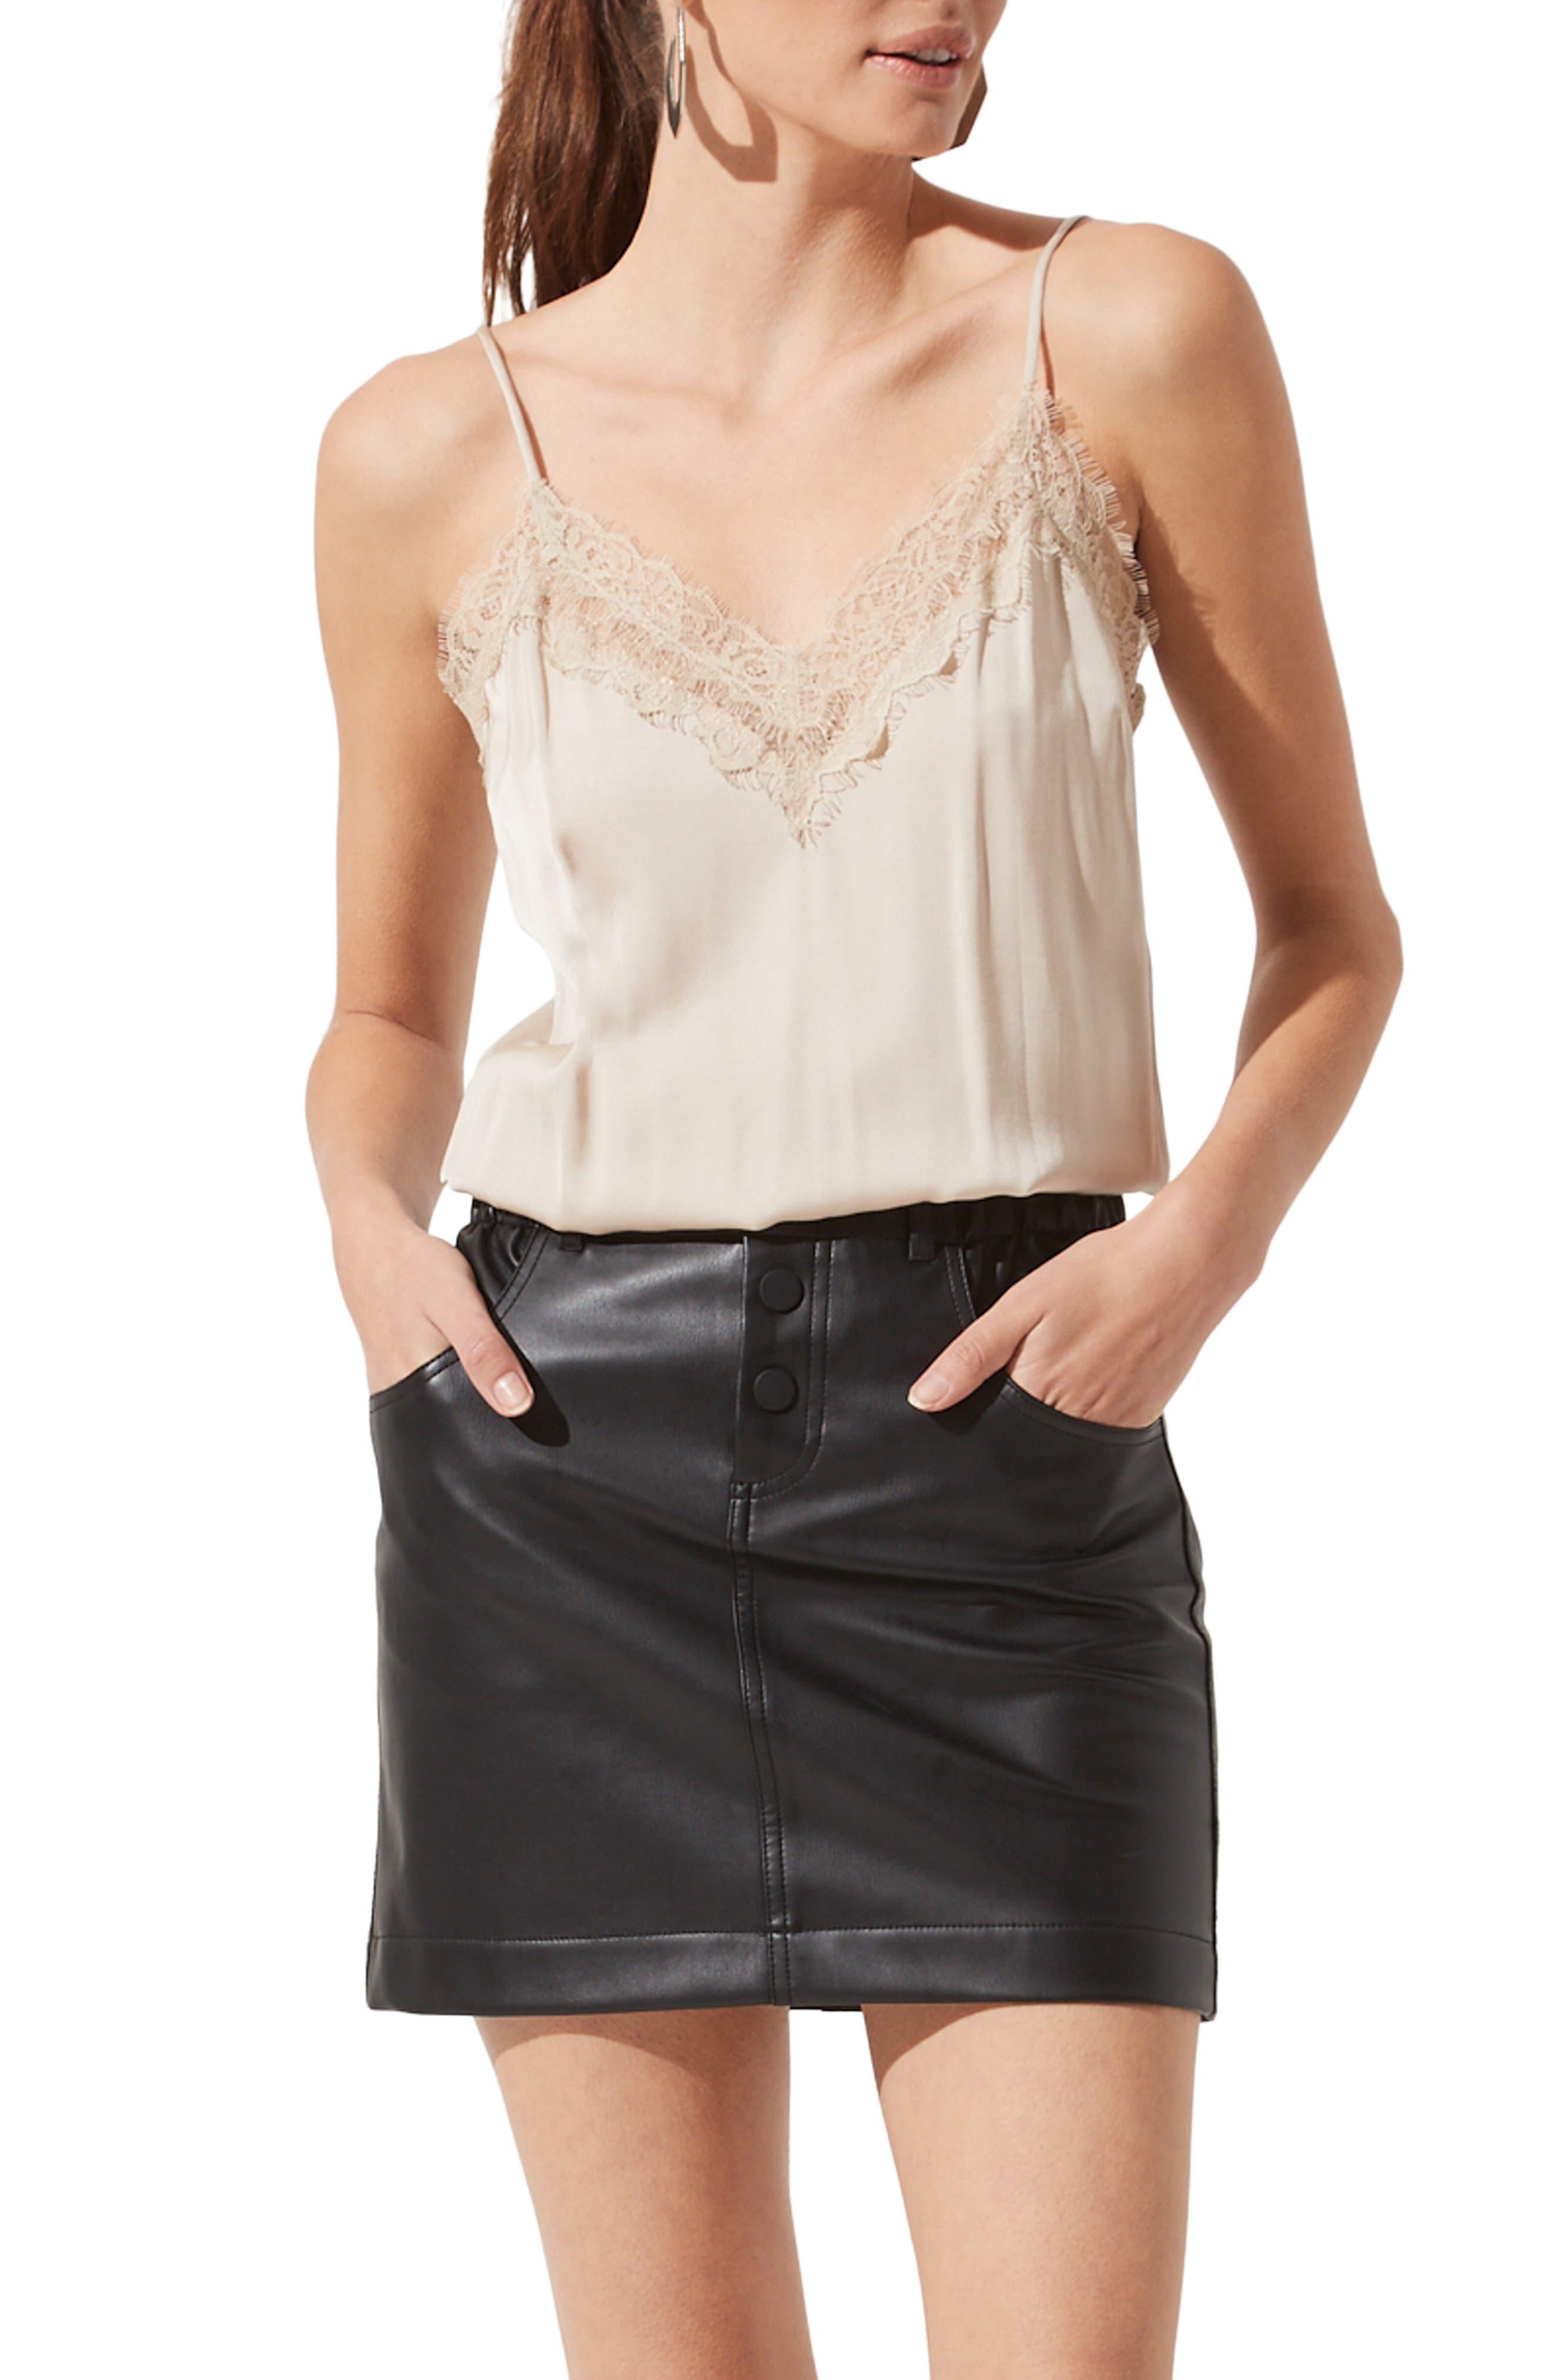 Lace Trim Camisole Bodysuit